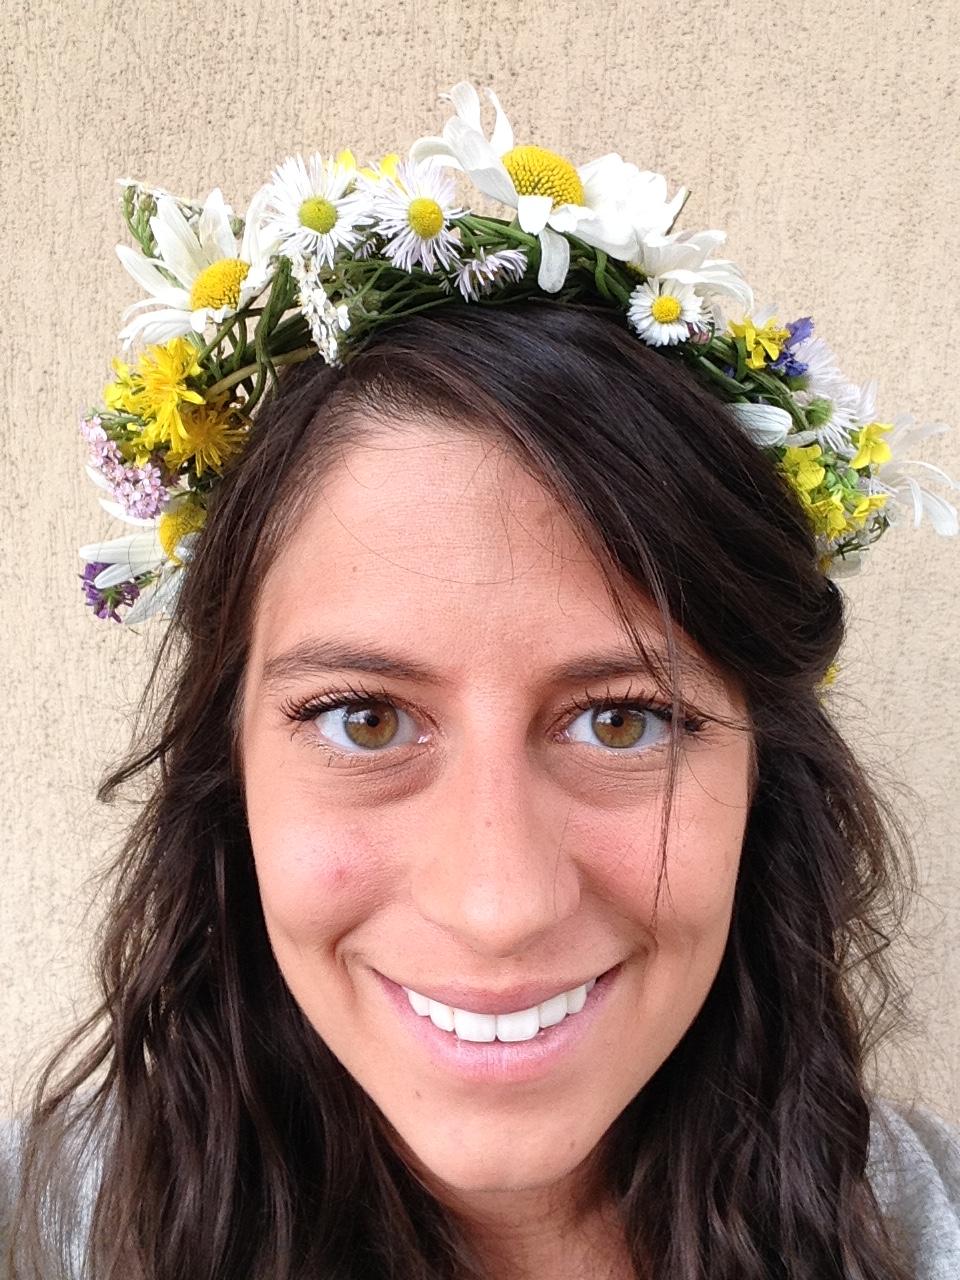 Flowers Near Me » medieval flower crown | Flowers Near Me